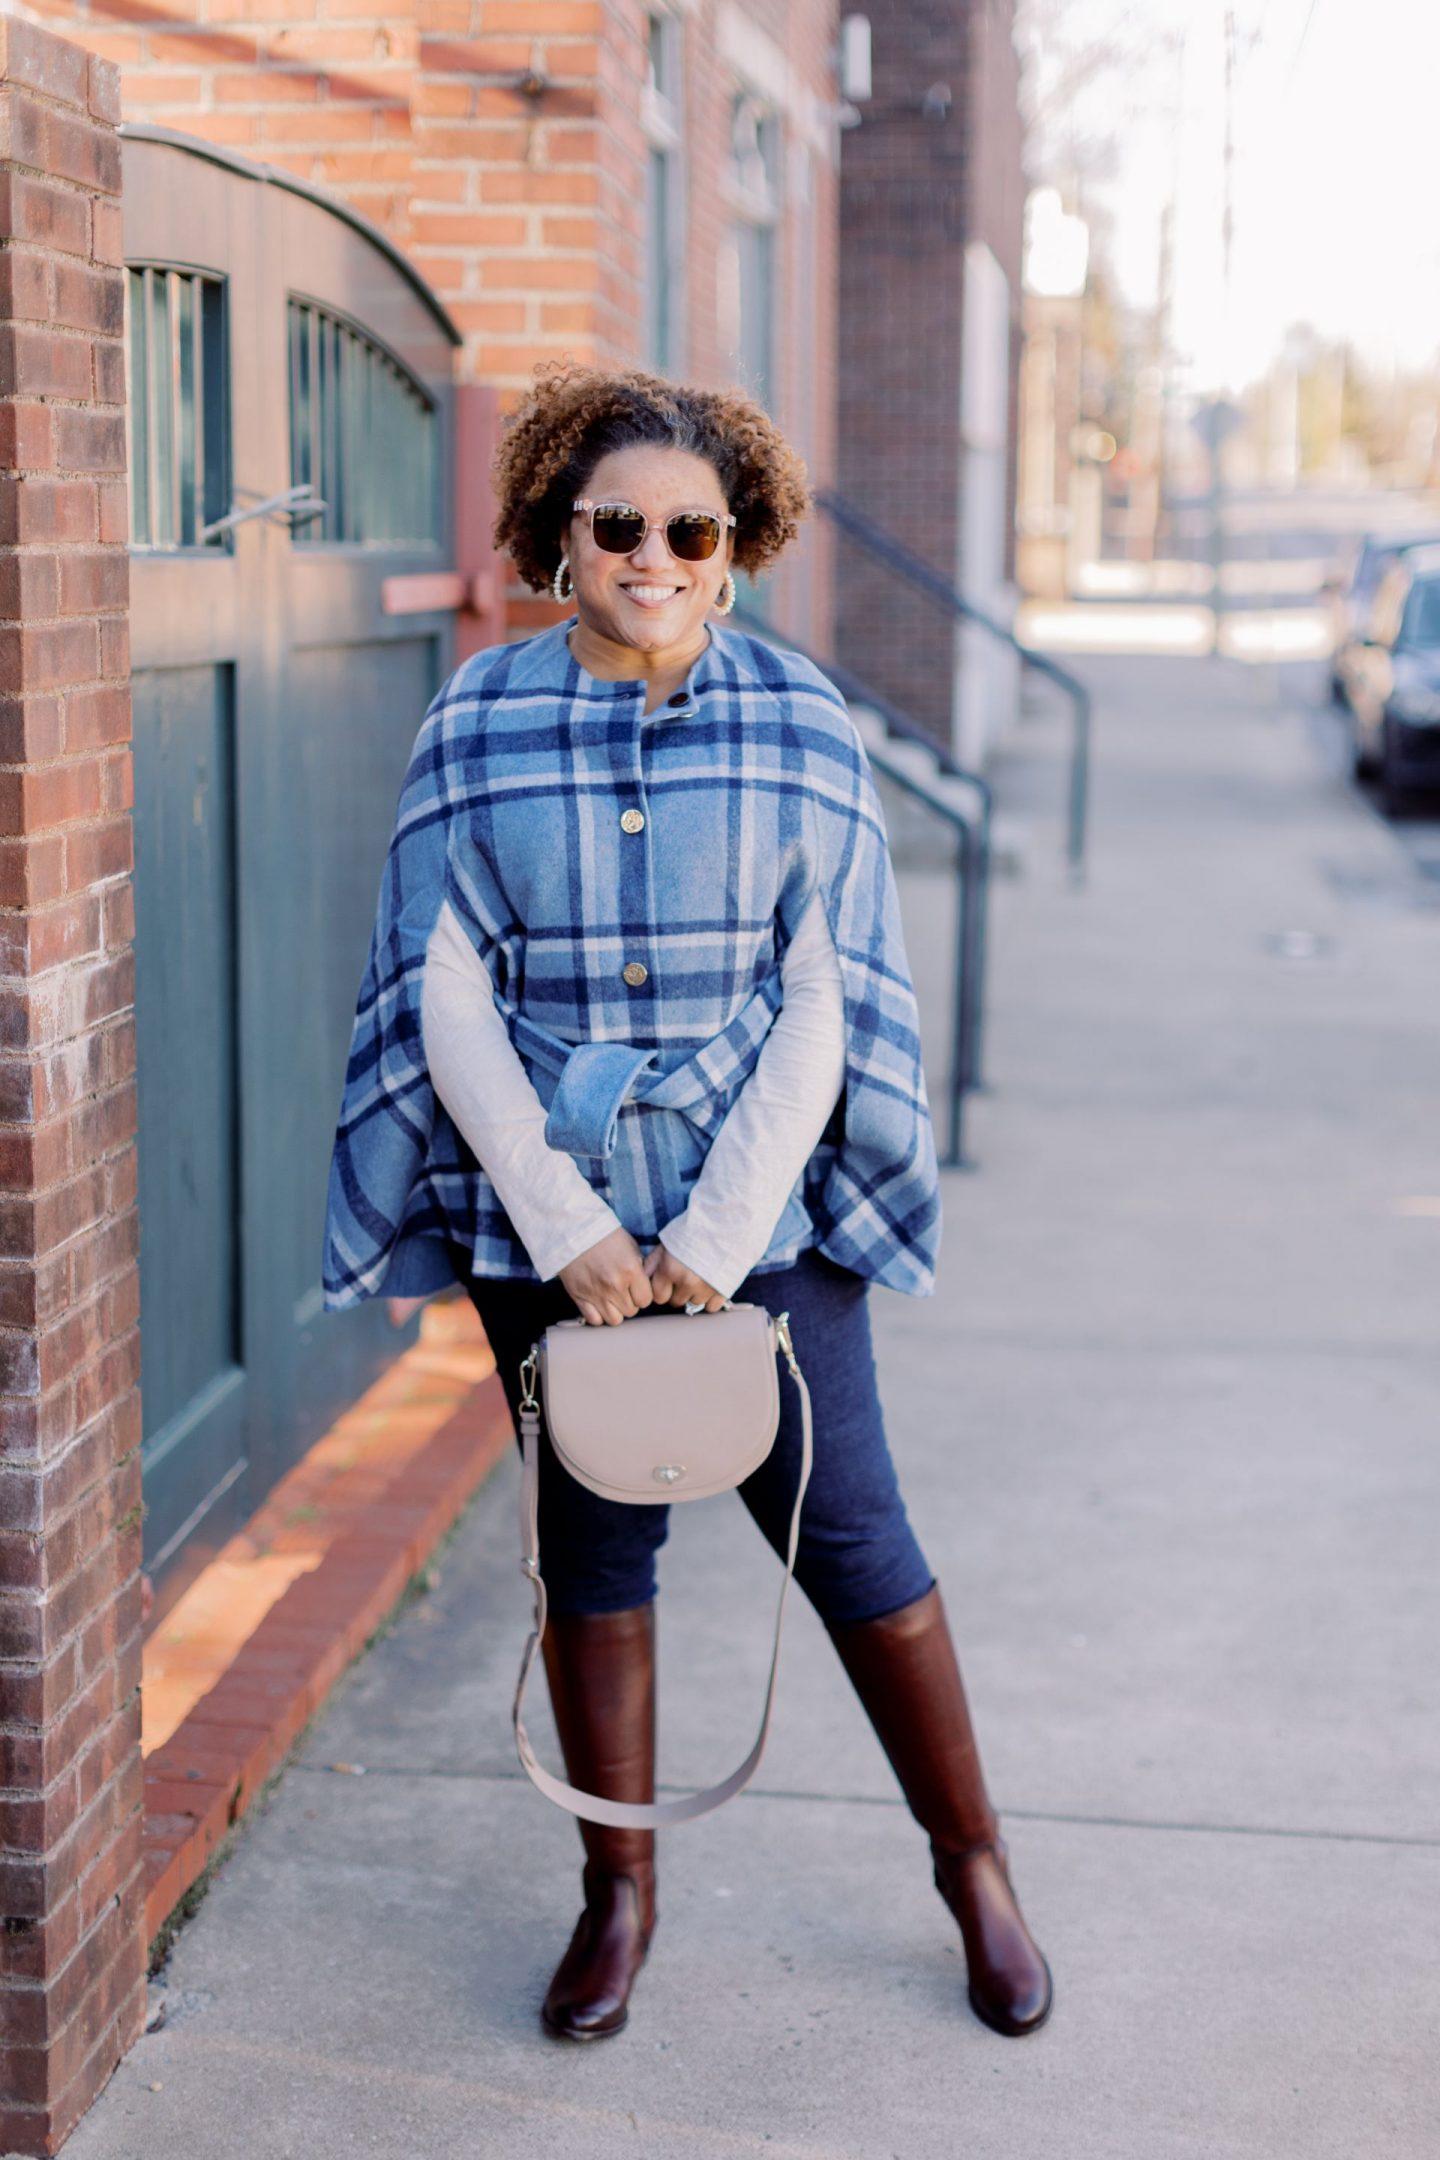 Buffalo Plaid Cape by popular Kentucky fashion blog, Really Rynetta: image of a woman wearing a Draper James buffalo plaid cape, white long sleeve t-shirt, and skinny jeans.